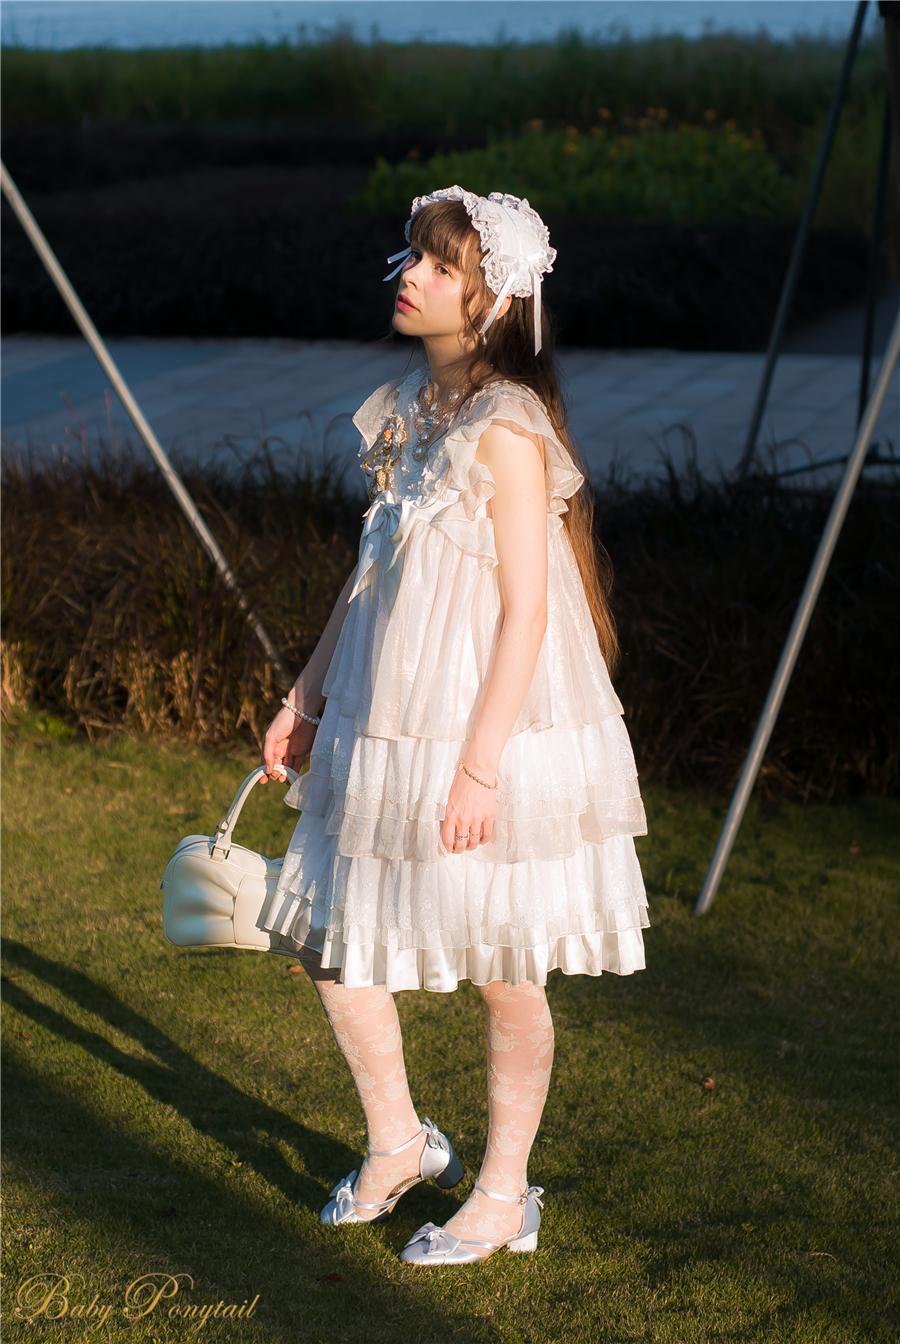 BabyPonytail_modelclaudia_Present Angel White JSK park10.jpg